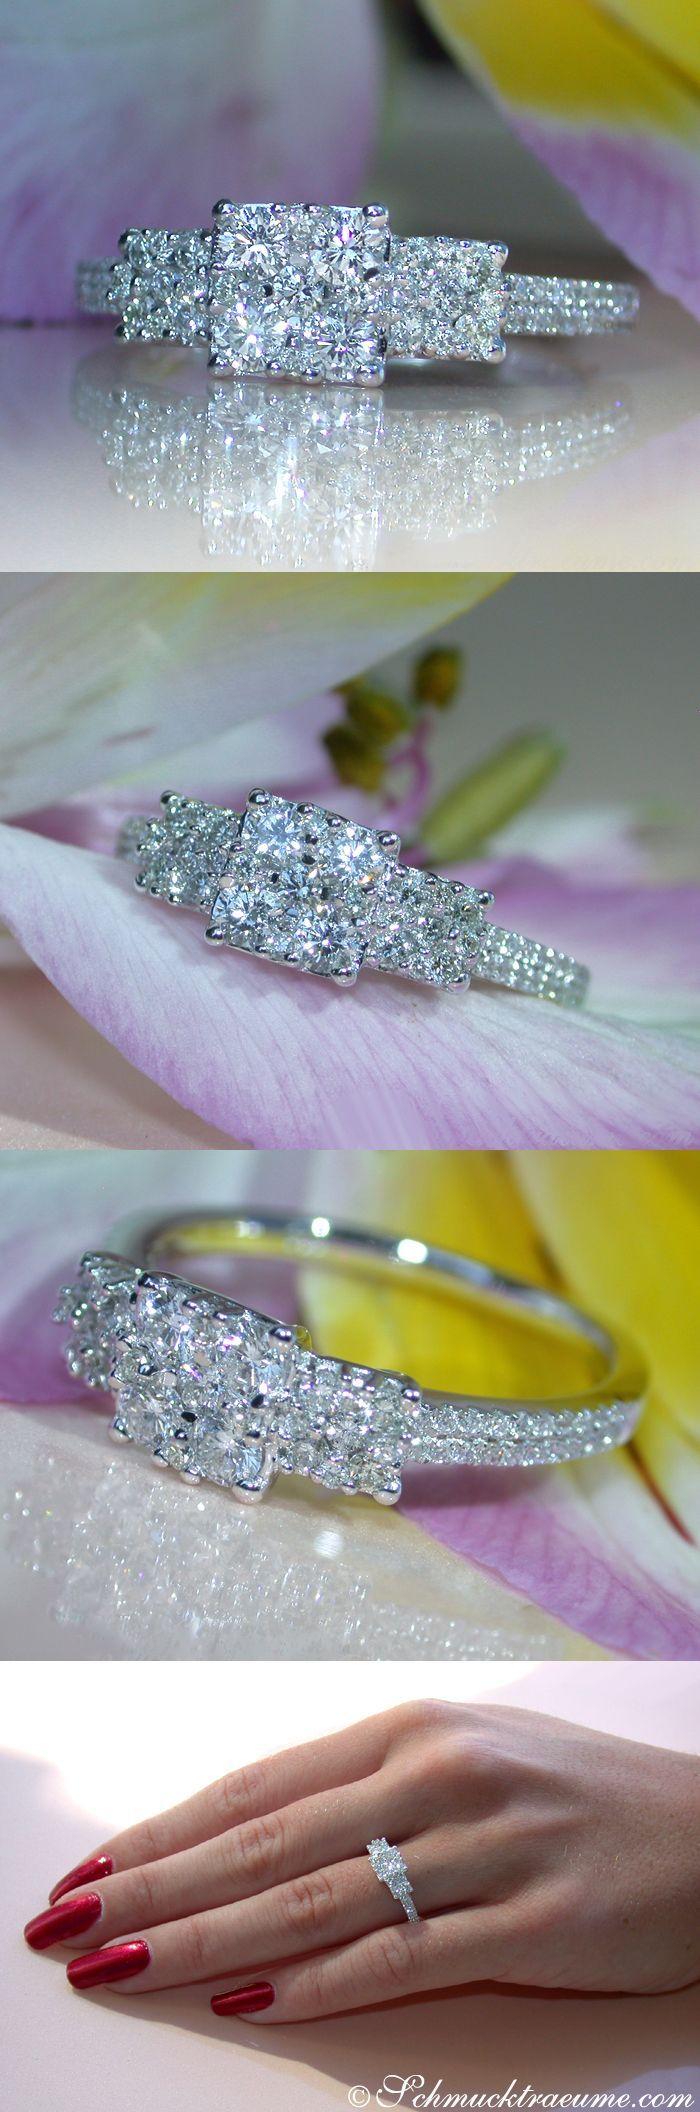 Cute Diamond Ring, .68 ct. G-SI/VS WG18K - Visit: schmucktraeume.com Mail: info[at]schmucktraeume.com: